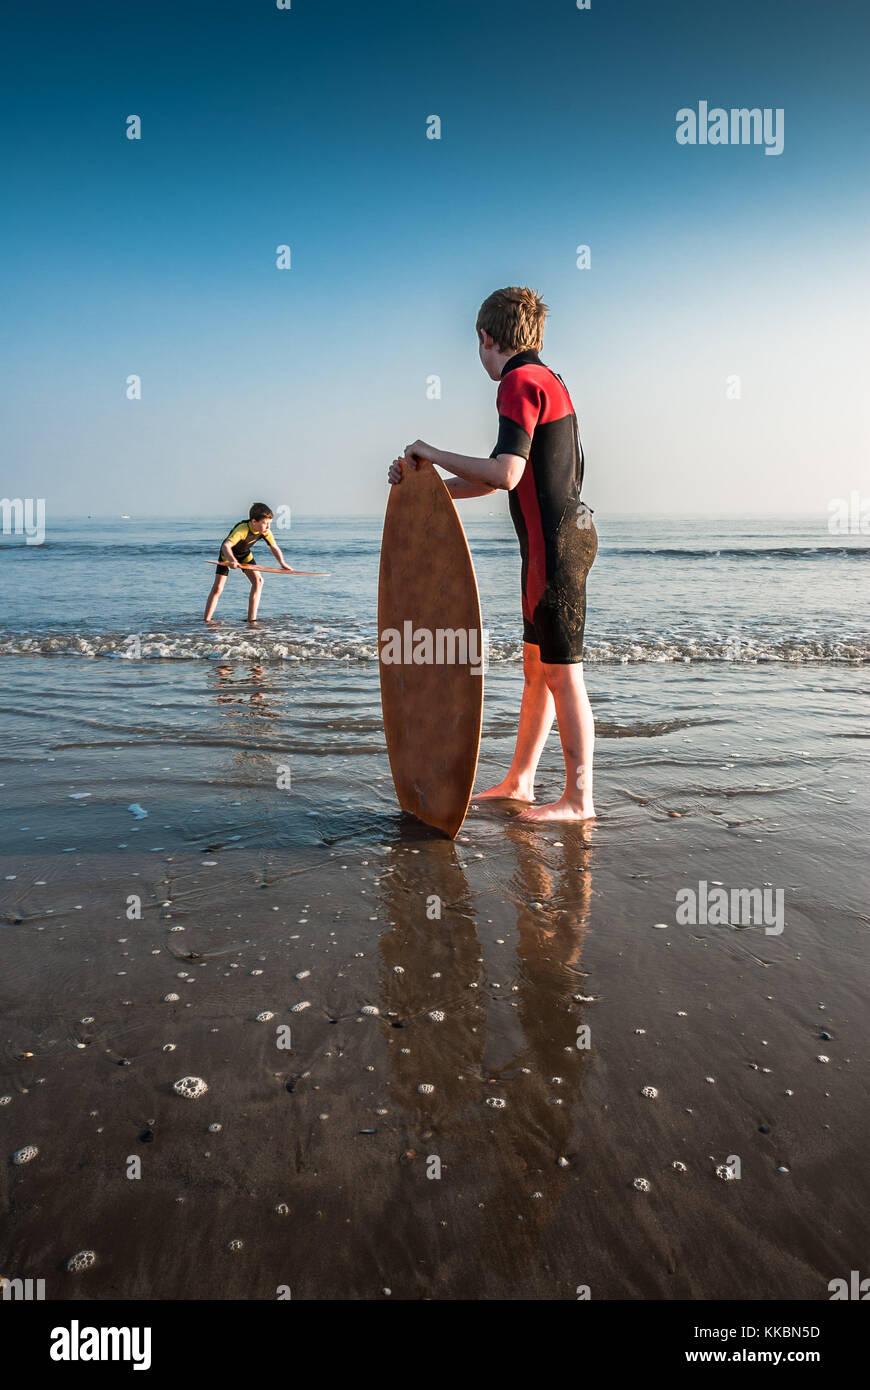 Two boys on a beach skim surfing. Stock Photo